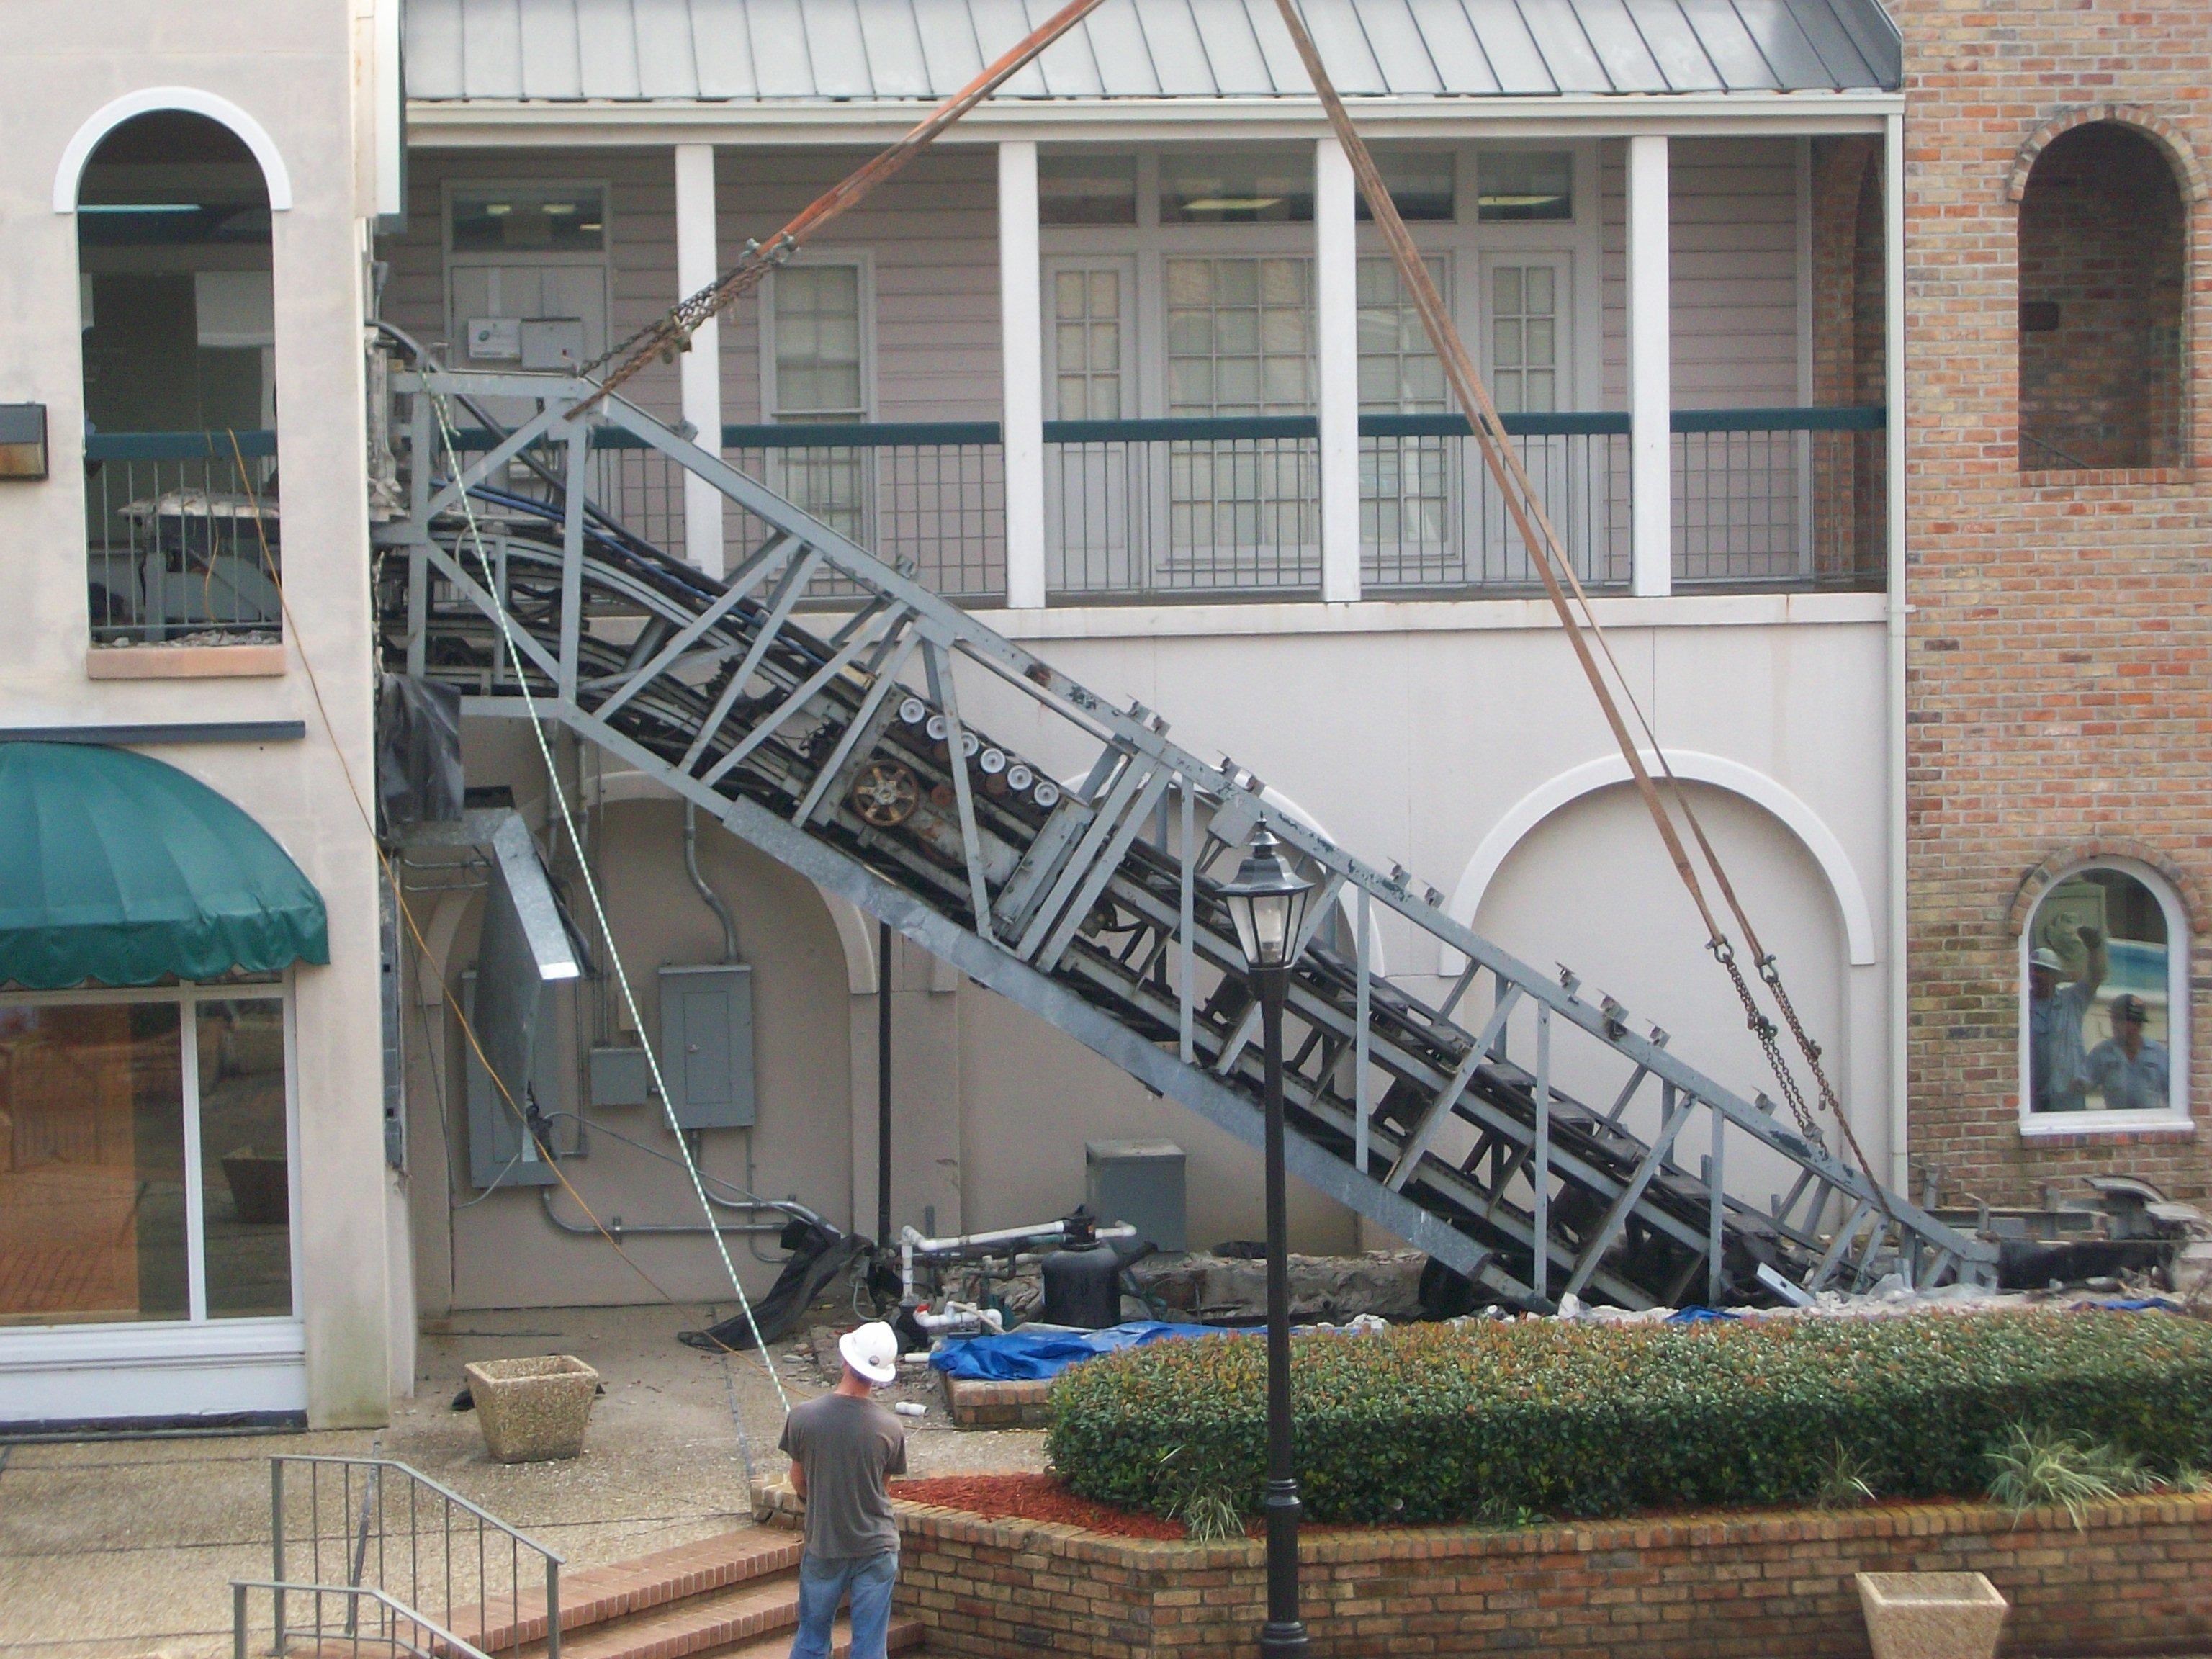 Escalator at Tulane Family Health Center